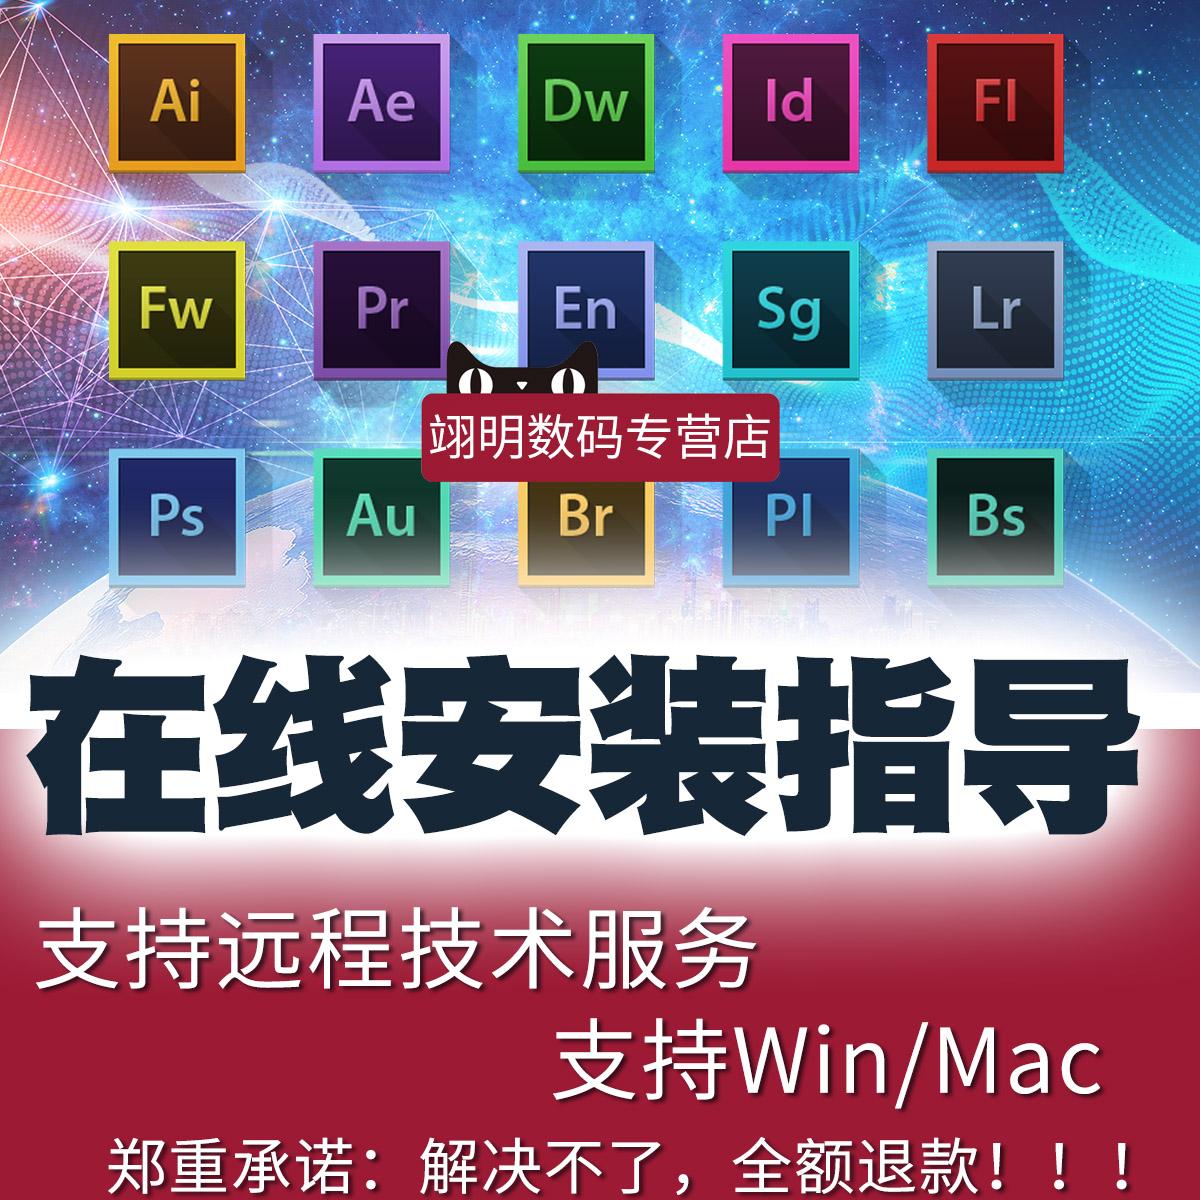 PS软件 AE AI PR 远程安装包下载photoshop cc2018 win mac版插件